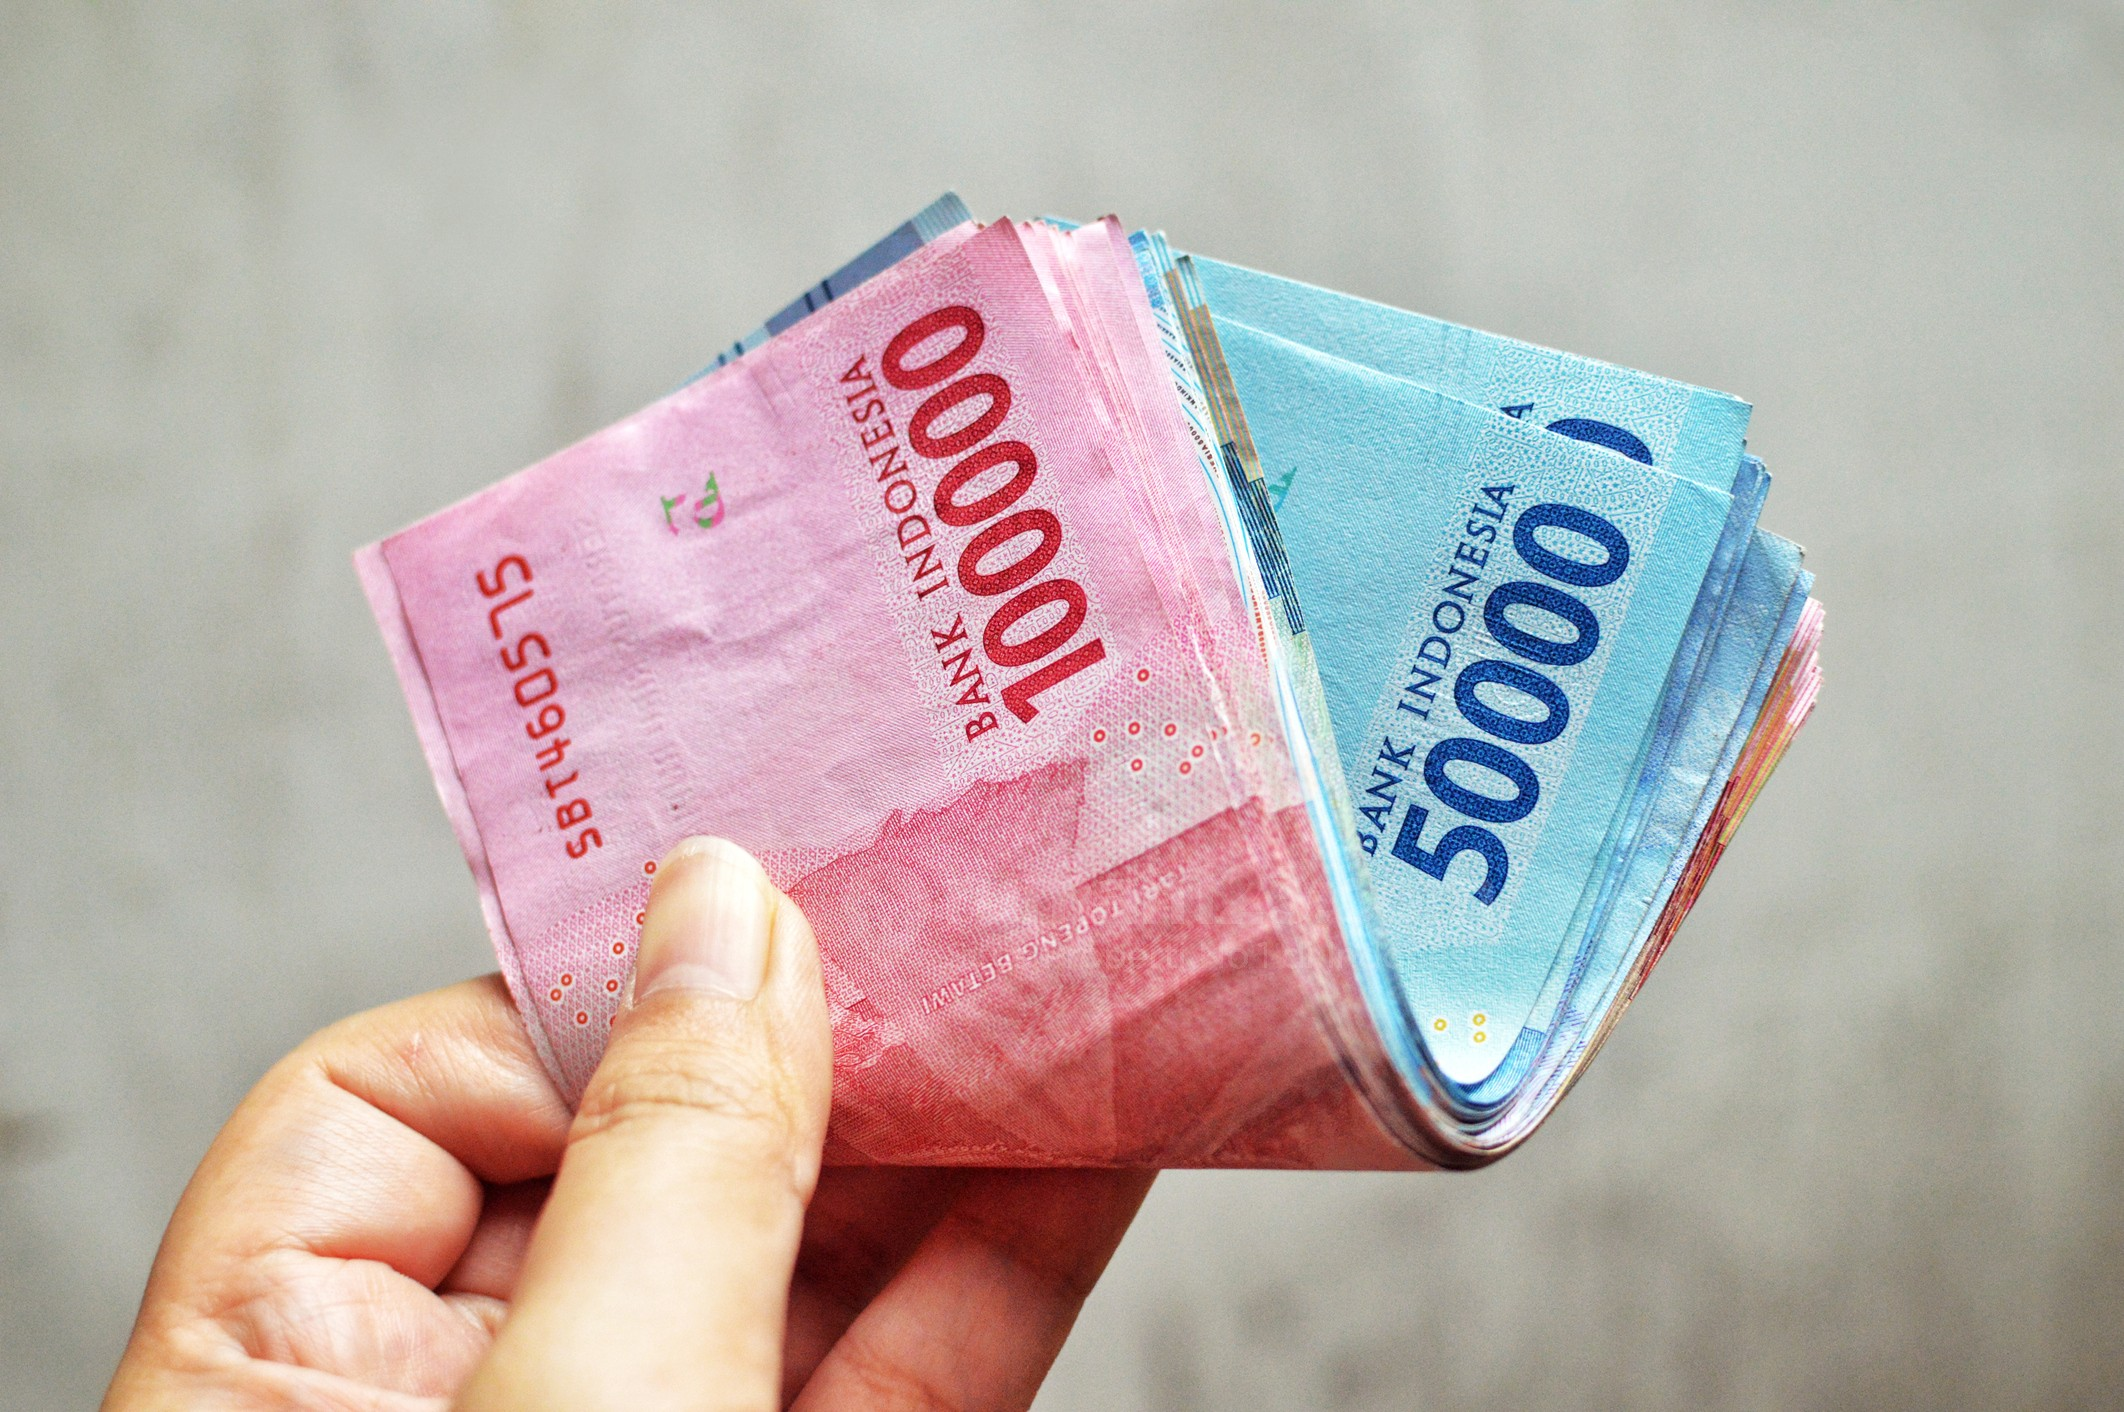 Bangkrut Selepas Mudik Lebaran, Ini 4 Cara Memulihkan Keuangan